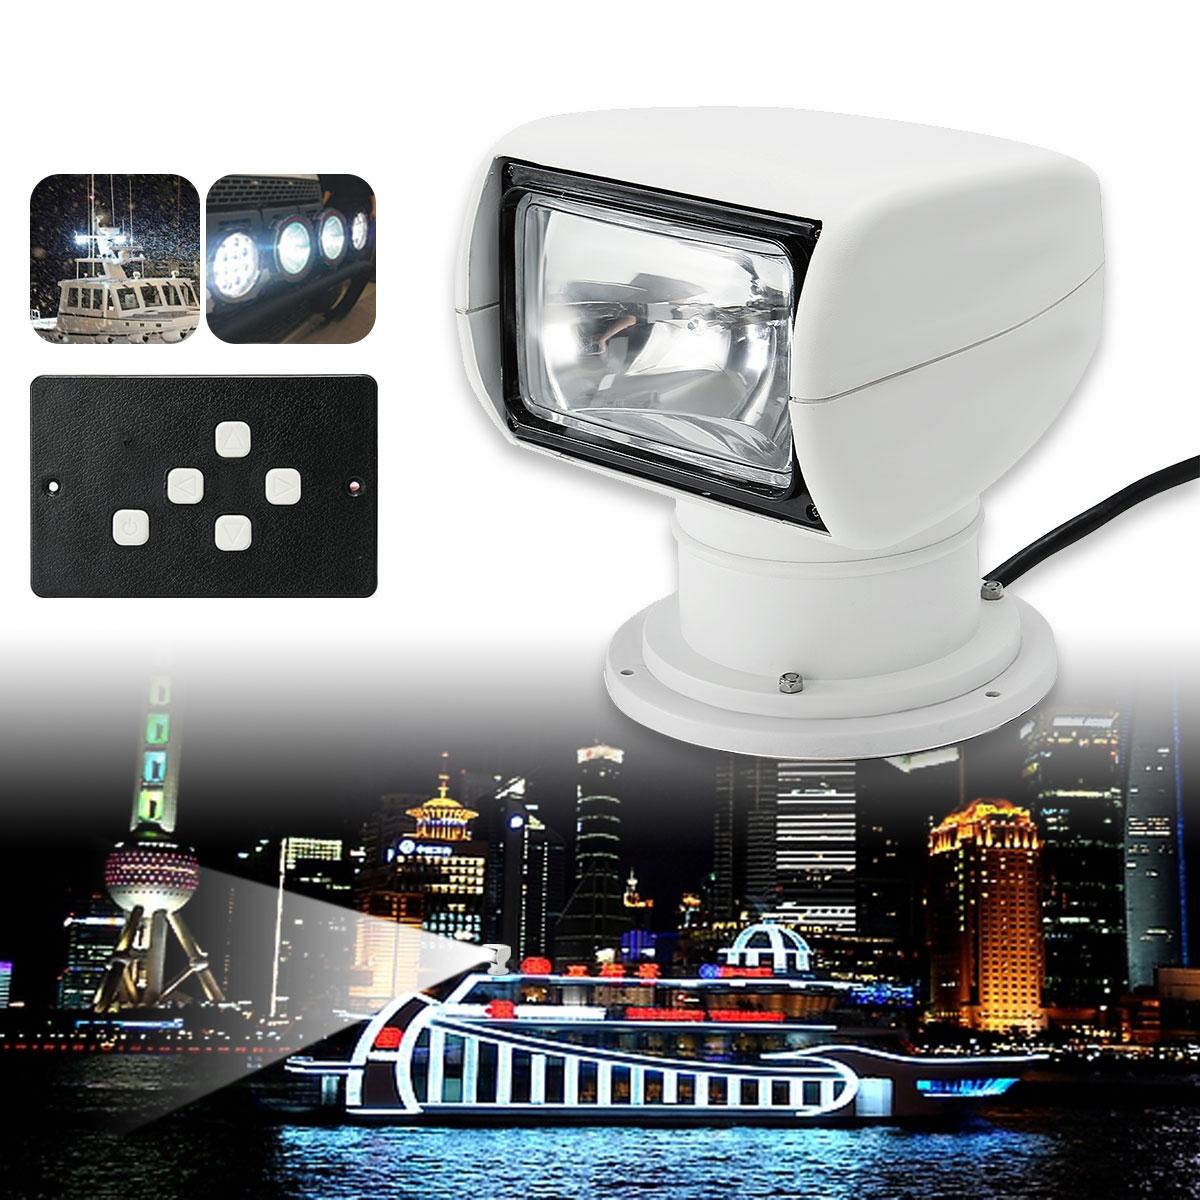 Smuxi Spotlight 12V Marine Boat Spotlight 2500LM Remote Control White Adjustable Waterproof Searchlight Light PC+Aluminum